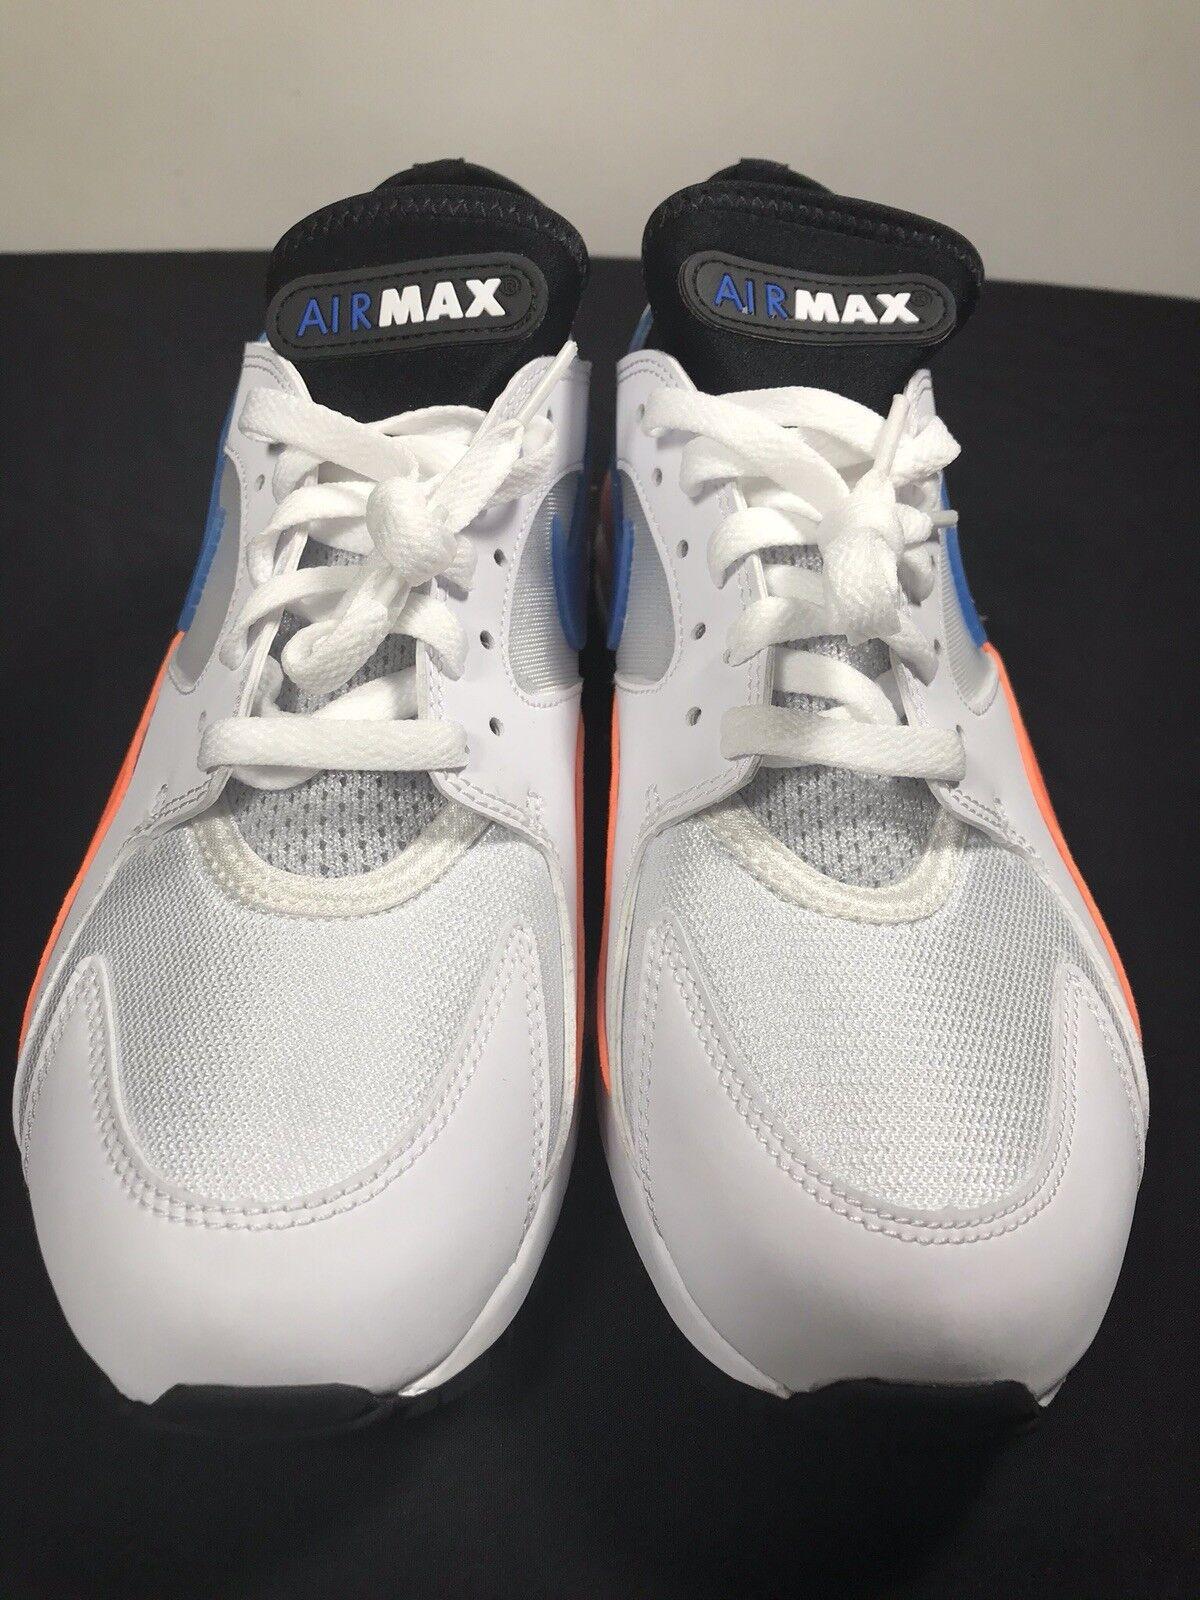 on sale 5420f 62a36 Nike air max max max 93 wihte   bluenebula   totale arancione 306551-104 sz